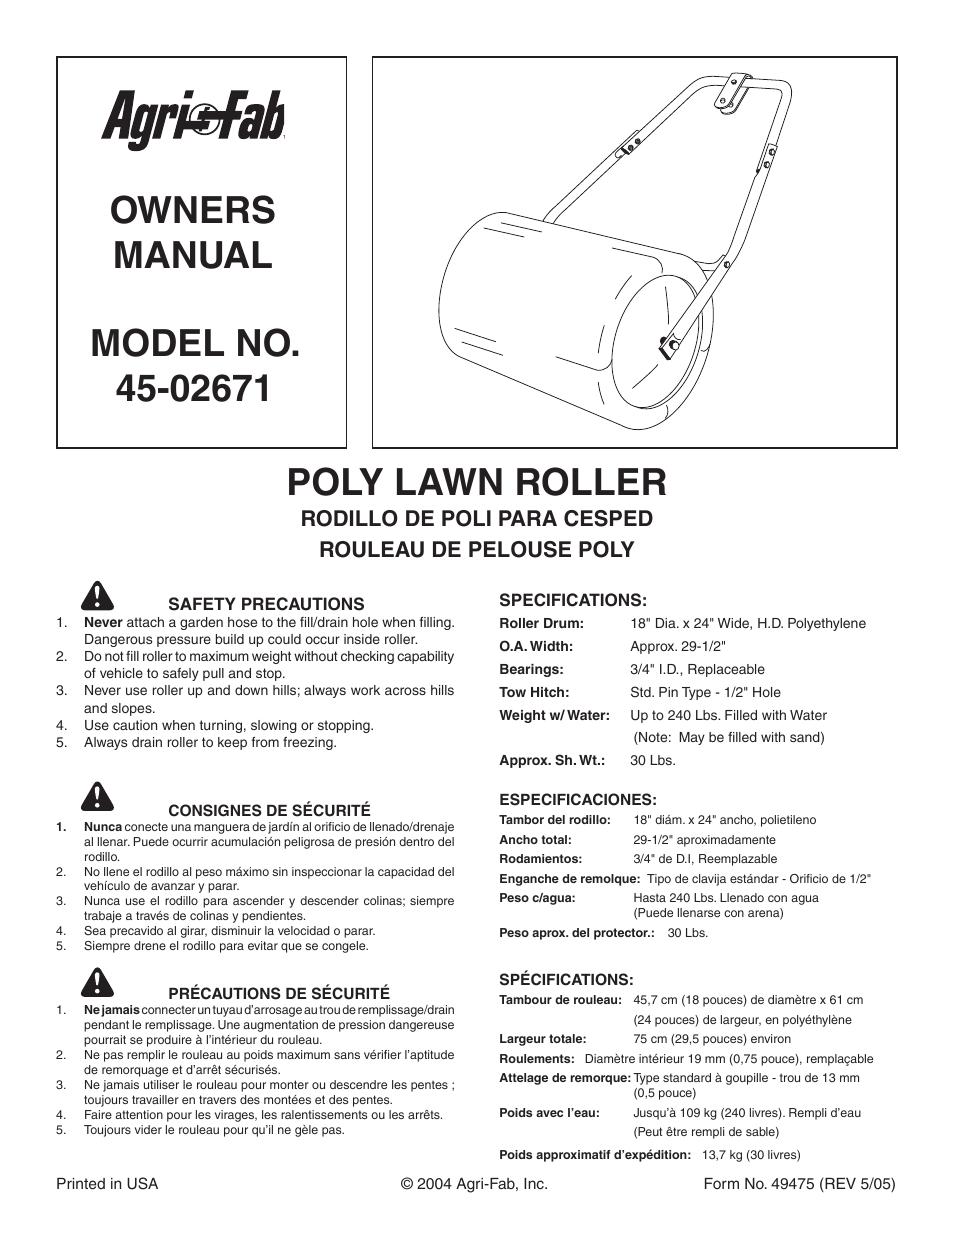 agri fab poly lawn roller 45 02671 user manual 2 pages original mode rh manualsdir com Agri-Fab Tow Behind Spreader Agri-Fab Snow Blowers